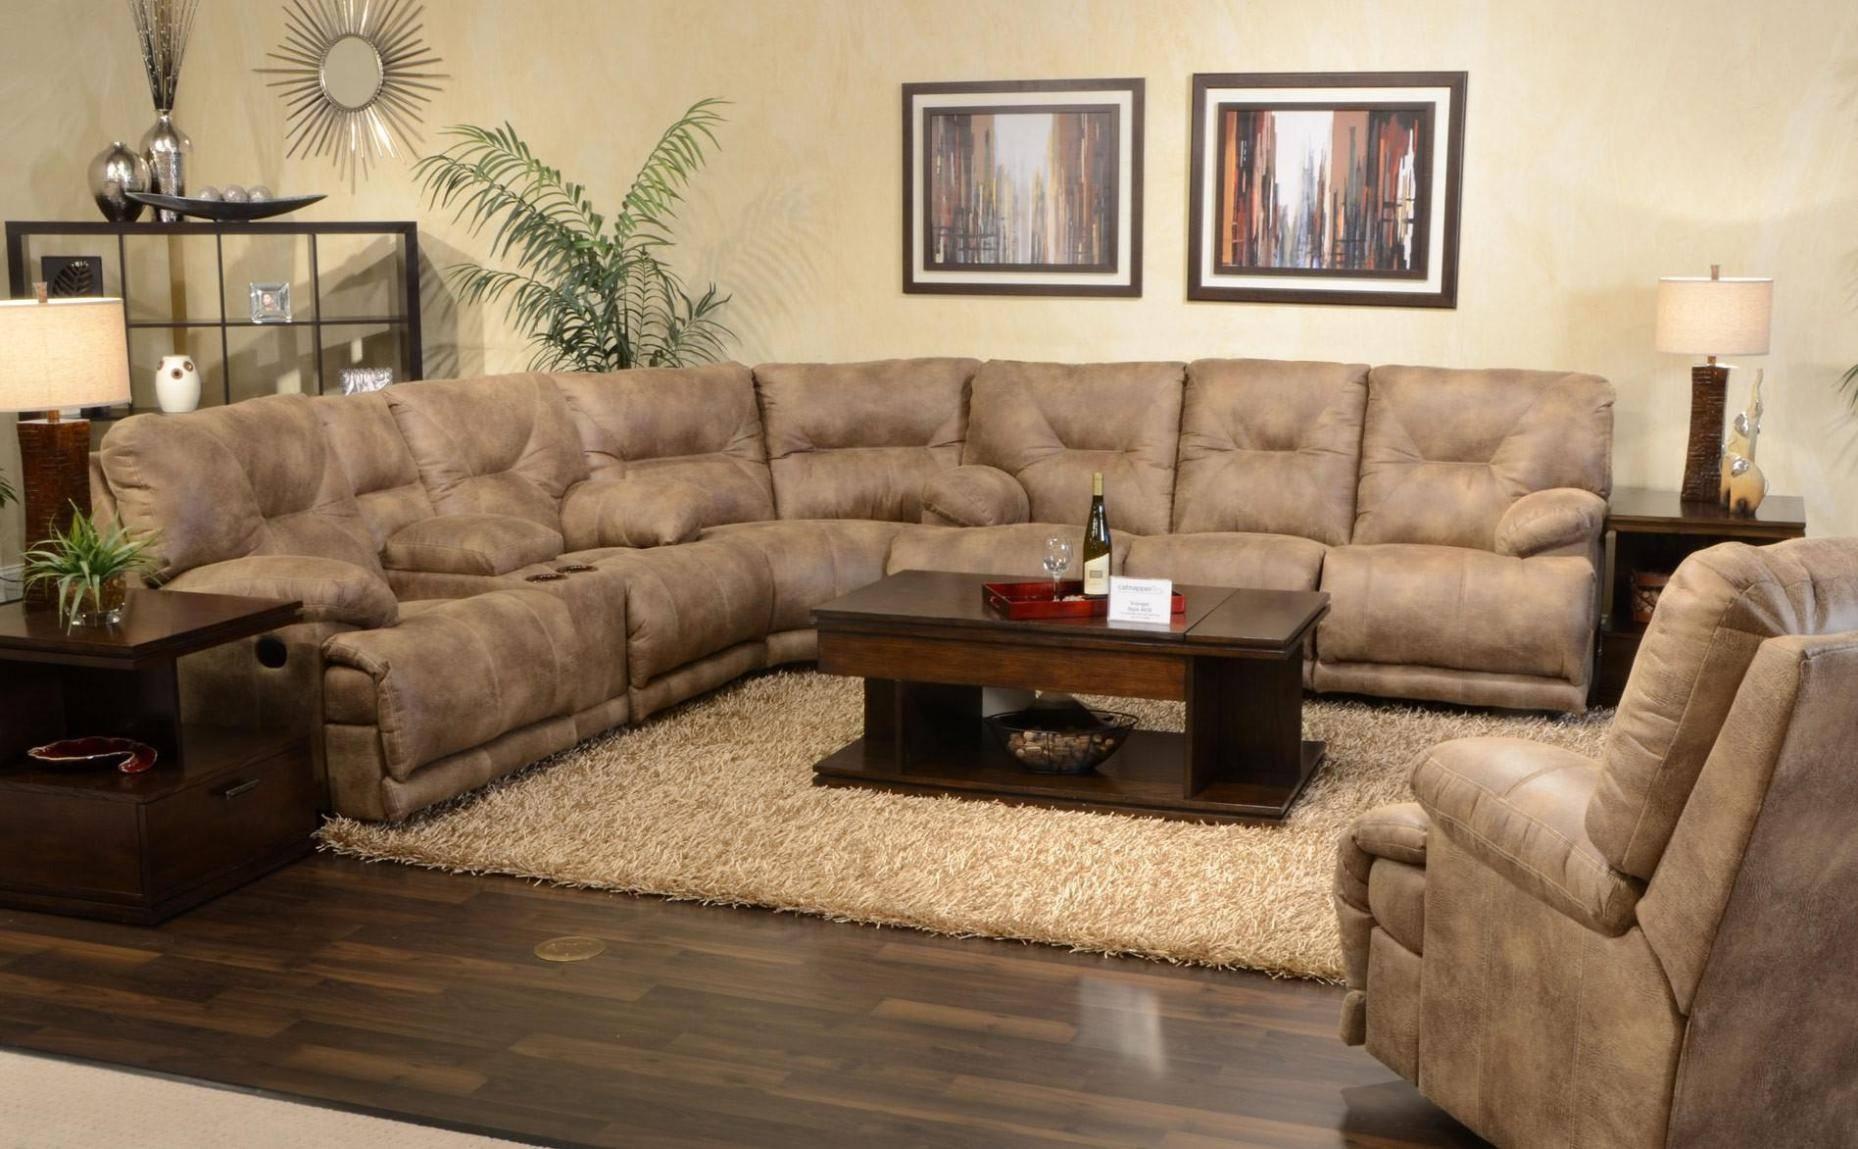 Sofa : Amazing Braxton Sectional Sofa Beautiful Home Design with regard to Braxton Sectional Sofas (Image 15 of 15)